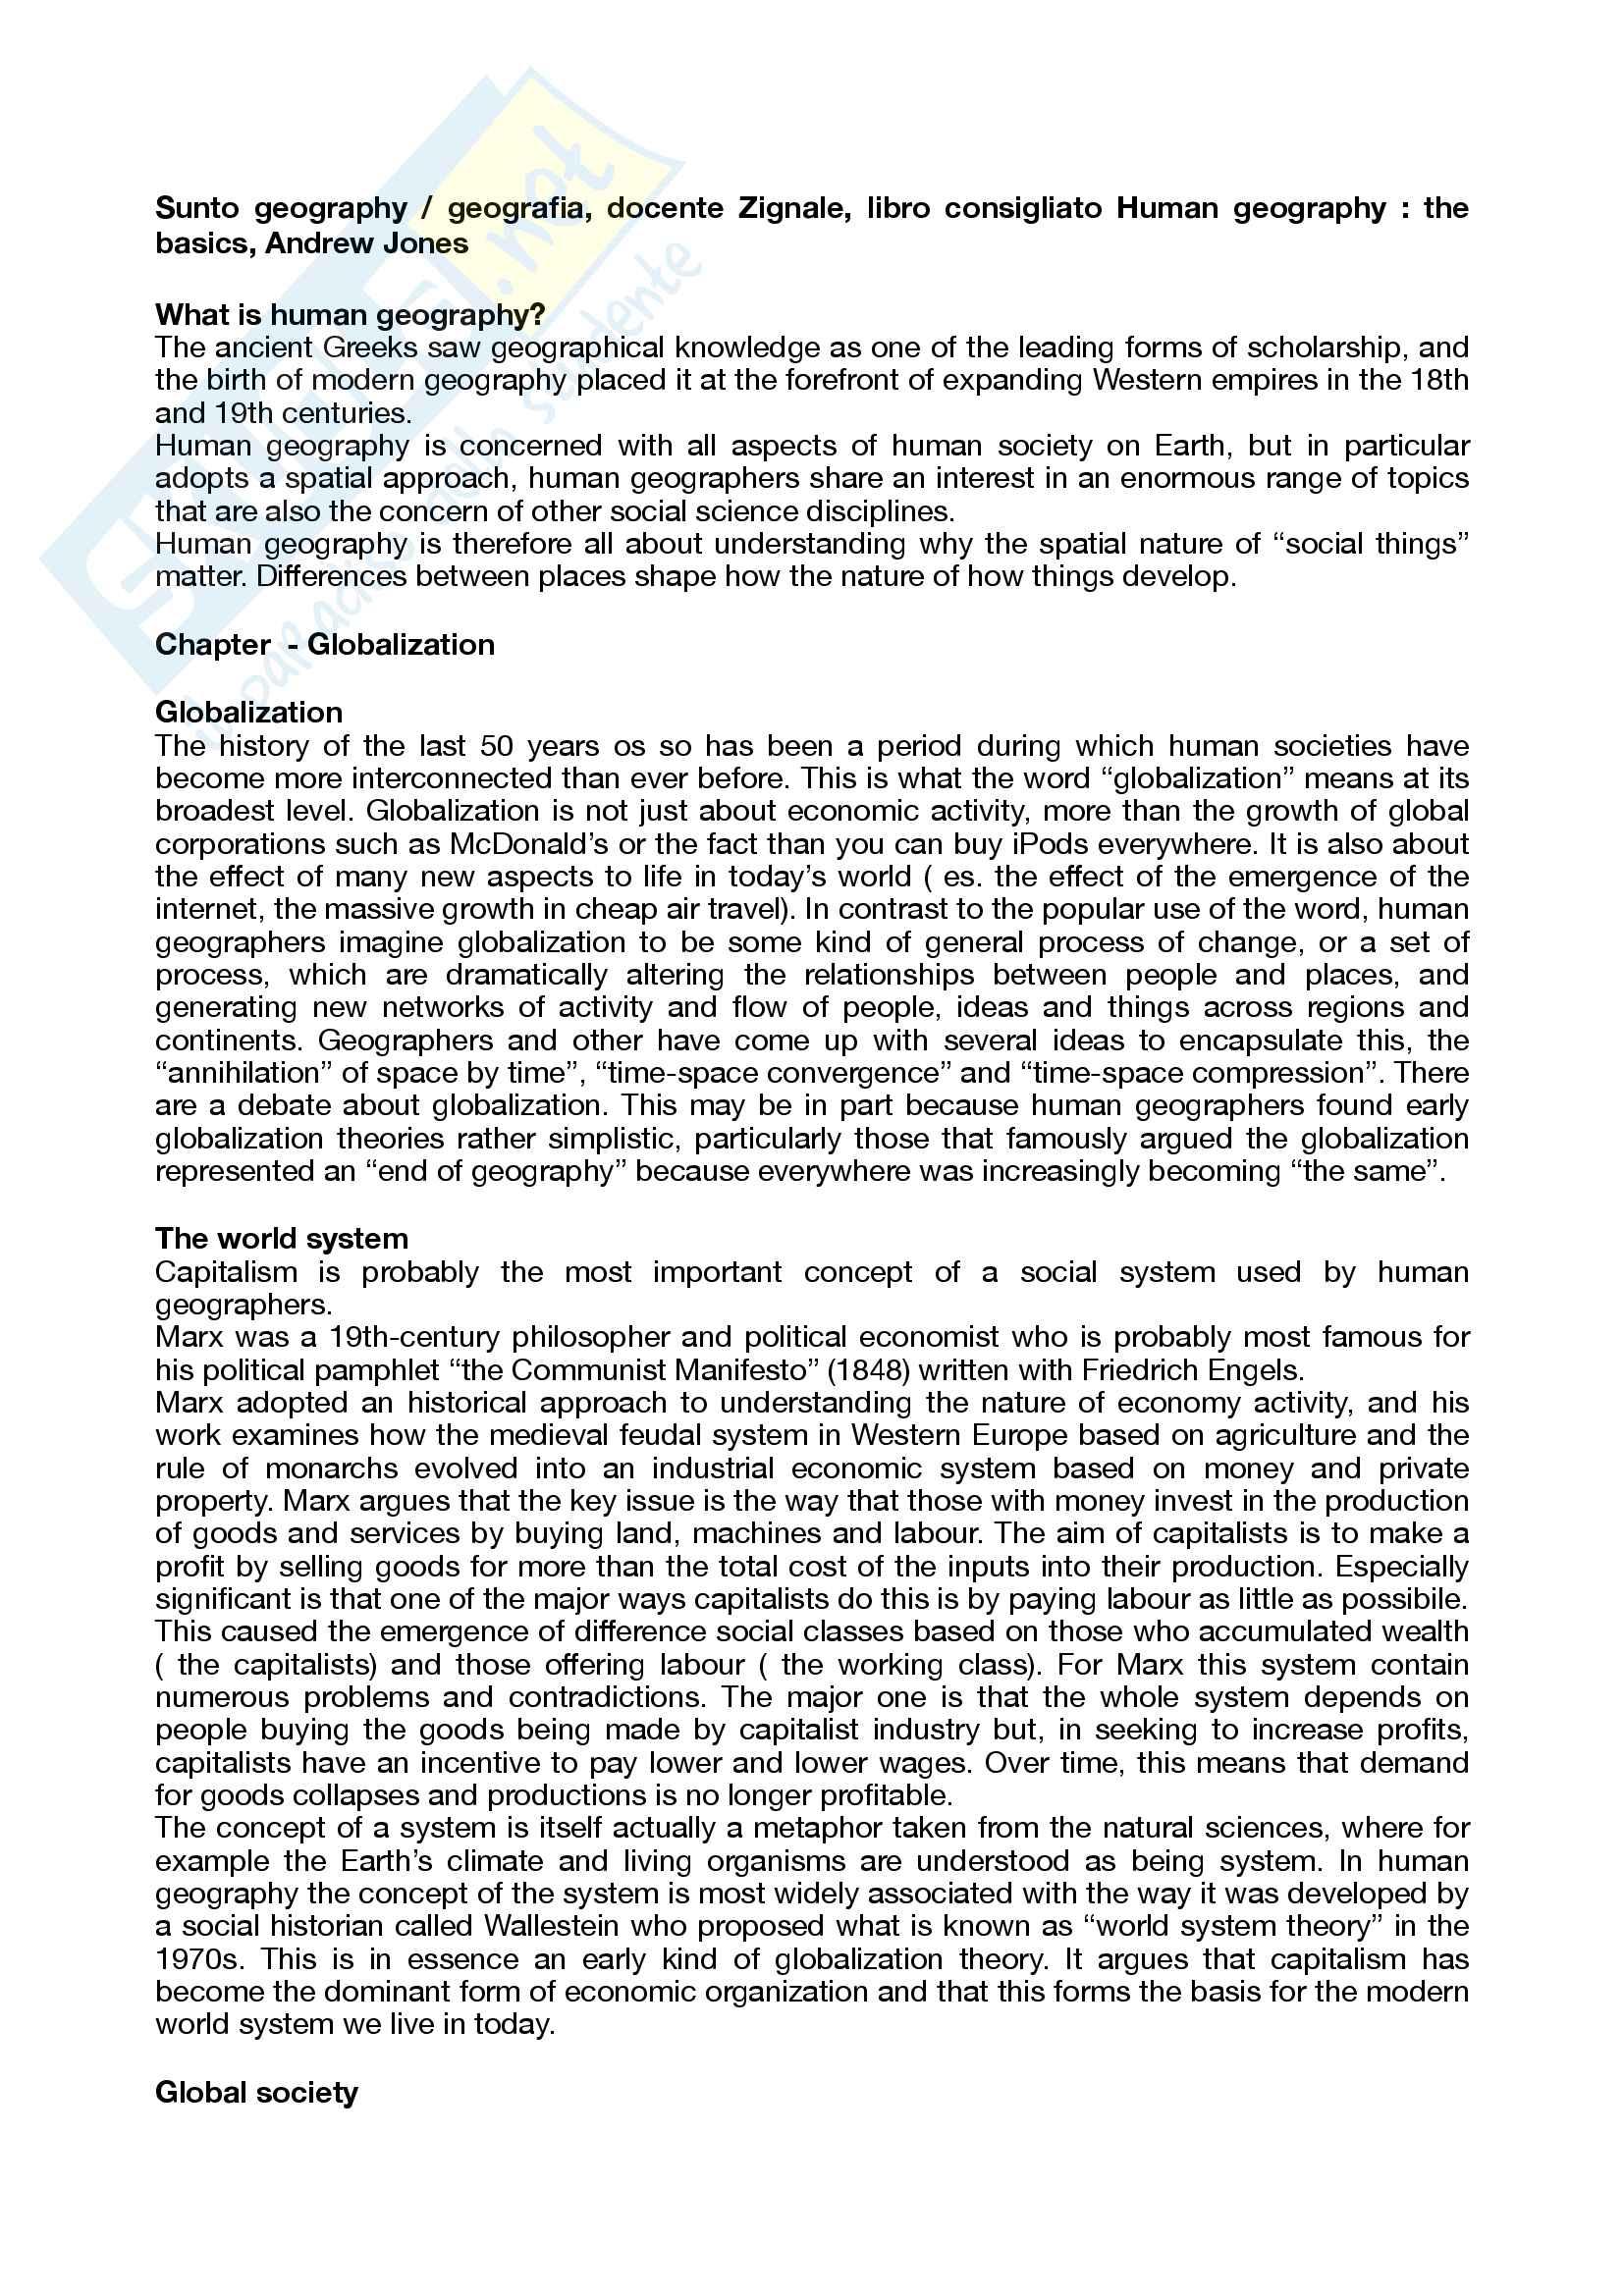 Riassunto esame geography / geografia, docente Zignale, libro consigliato Human geography: the basics, Andrew Jones